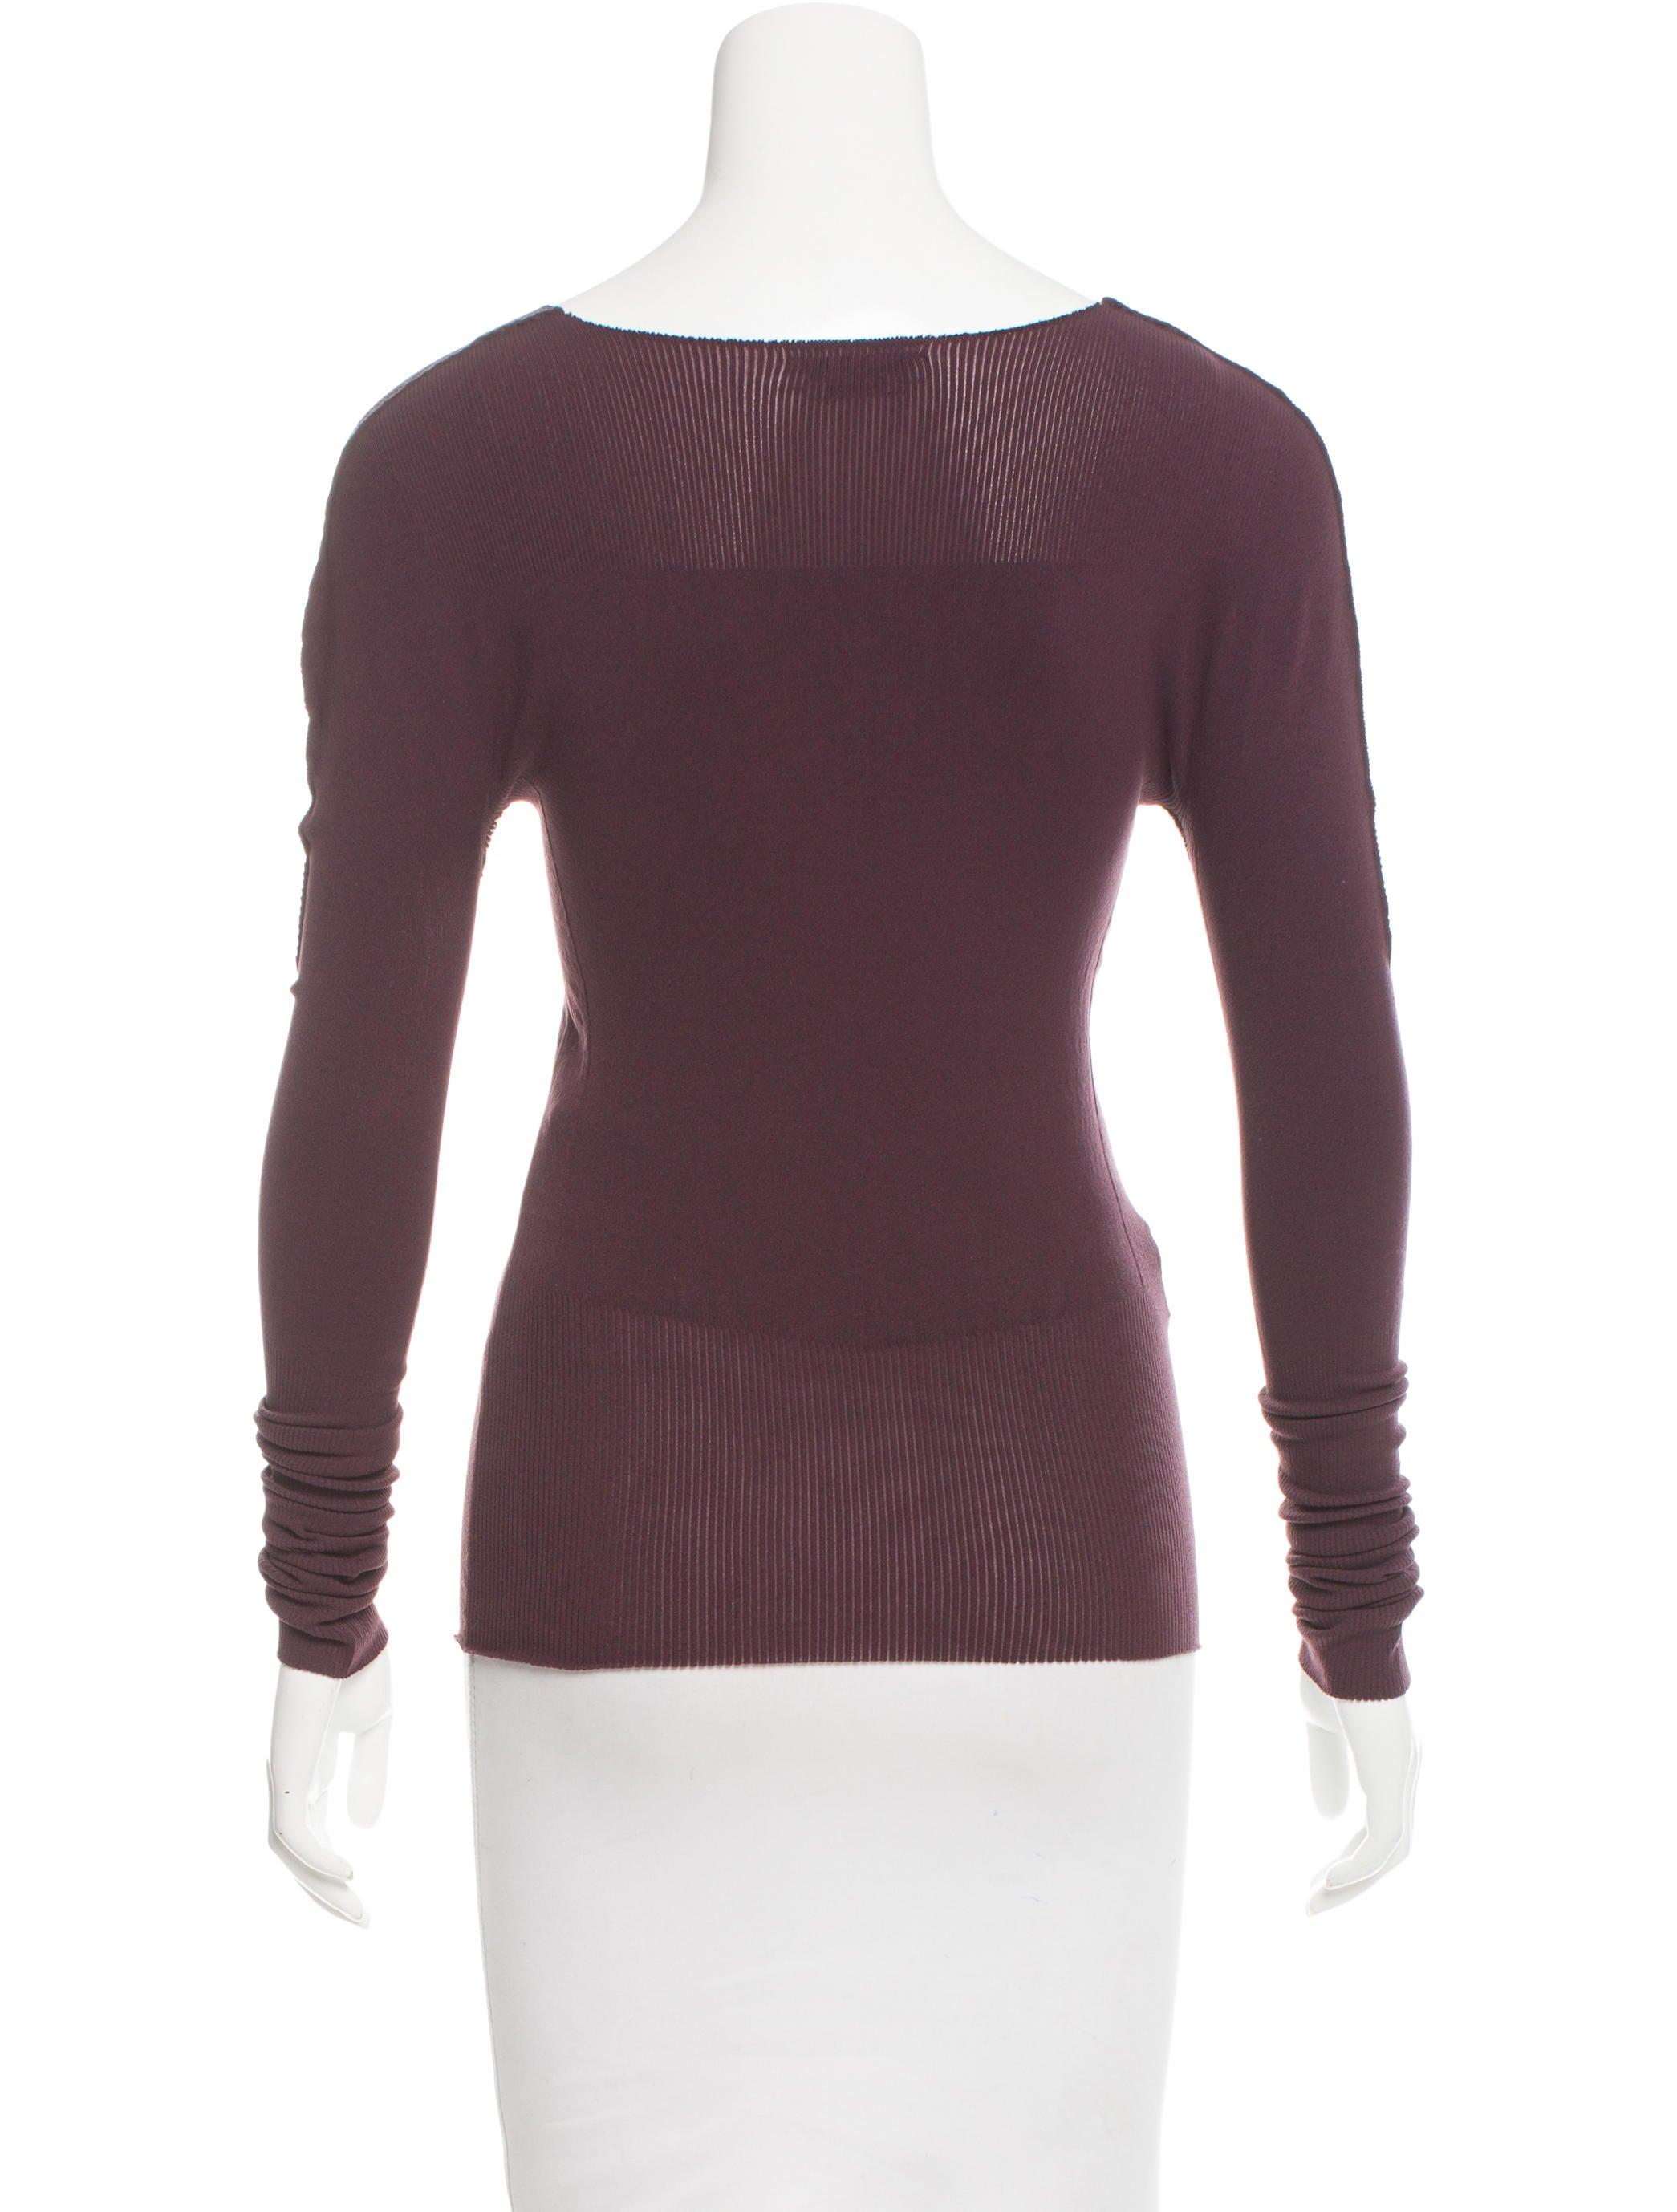 Prada sport raw edge rib knit top clothing wpr38992 for Raw edge t shirt women s